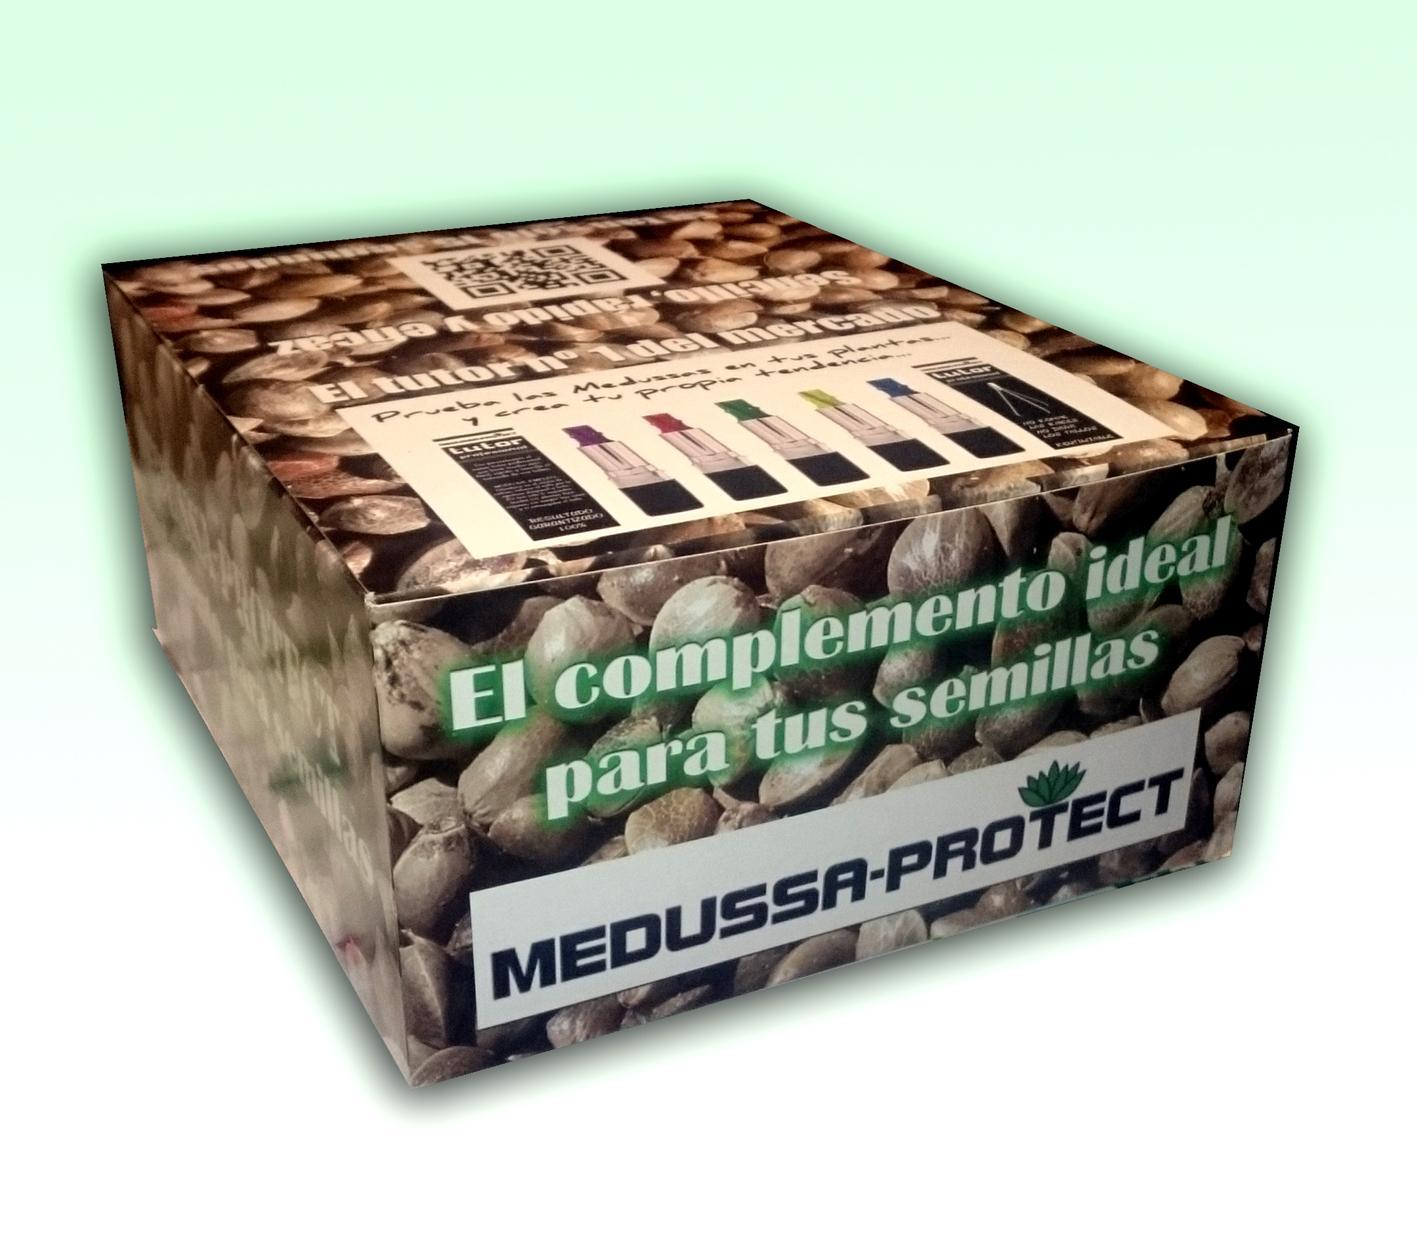 Nuevo formato 2016 para Medussa-Protect.